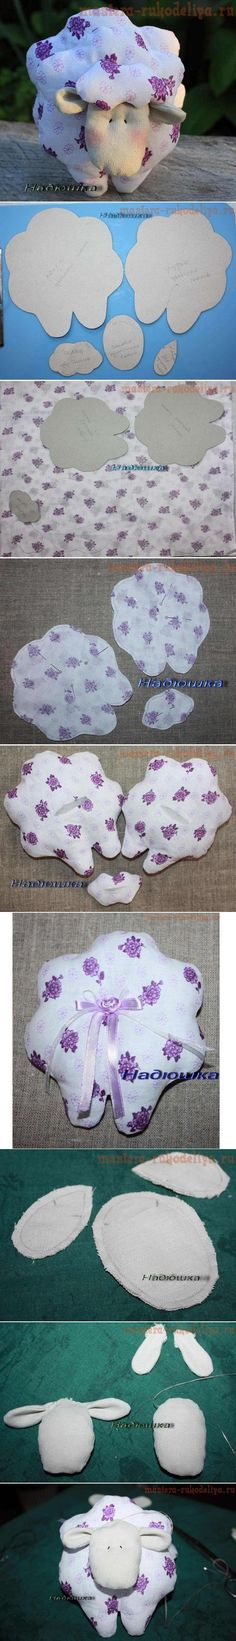 DIY Fabric Sheep Toy